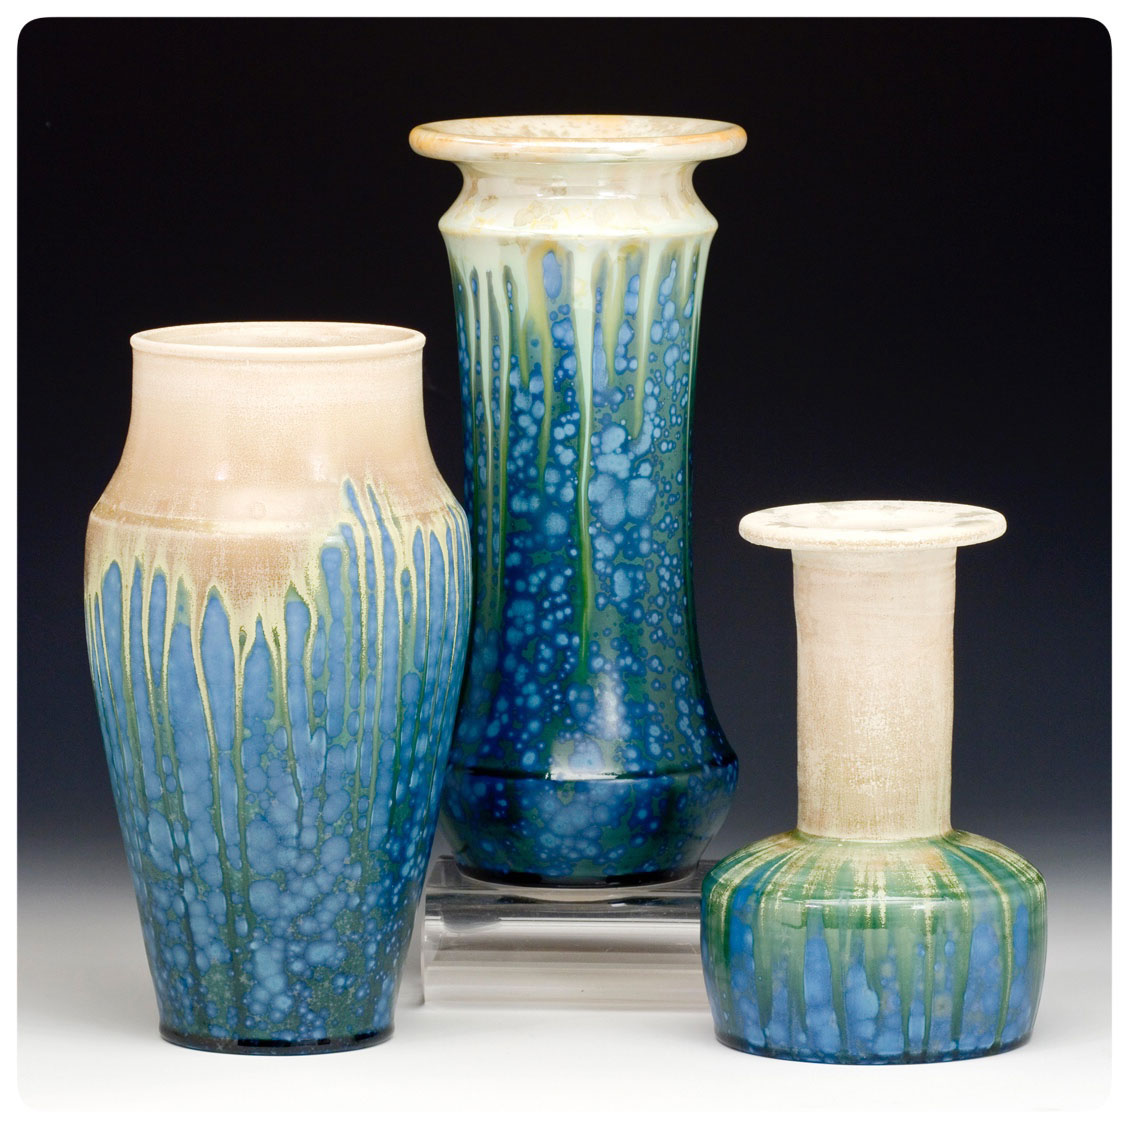 soft-blue-molybdenum-matte-crystalline-vase-grouping.jpg